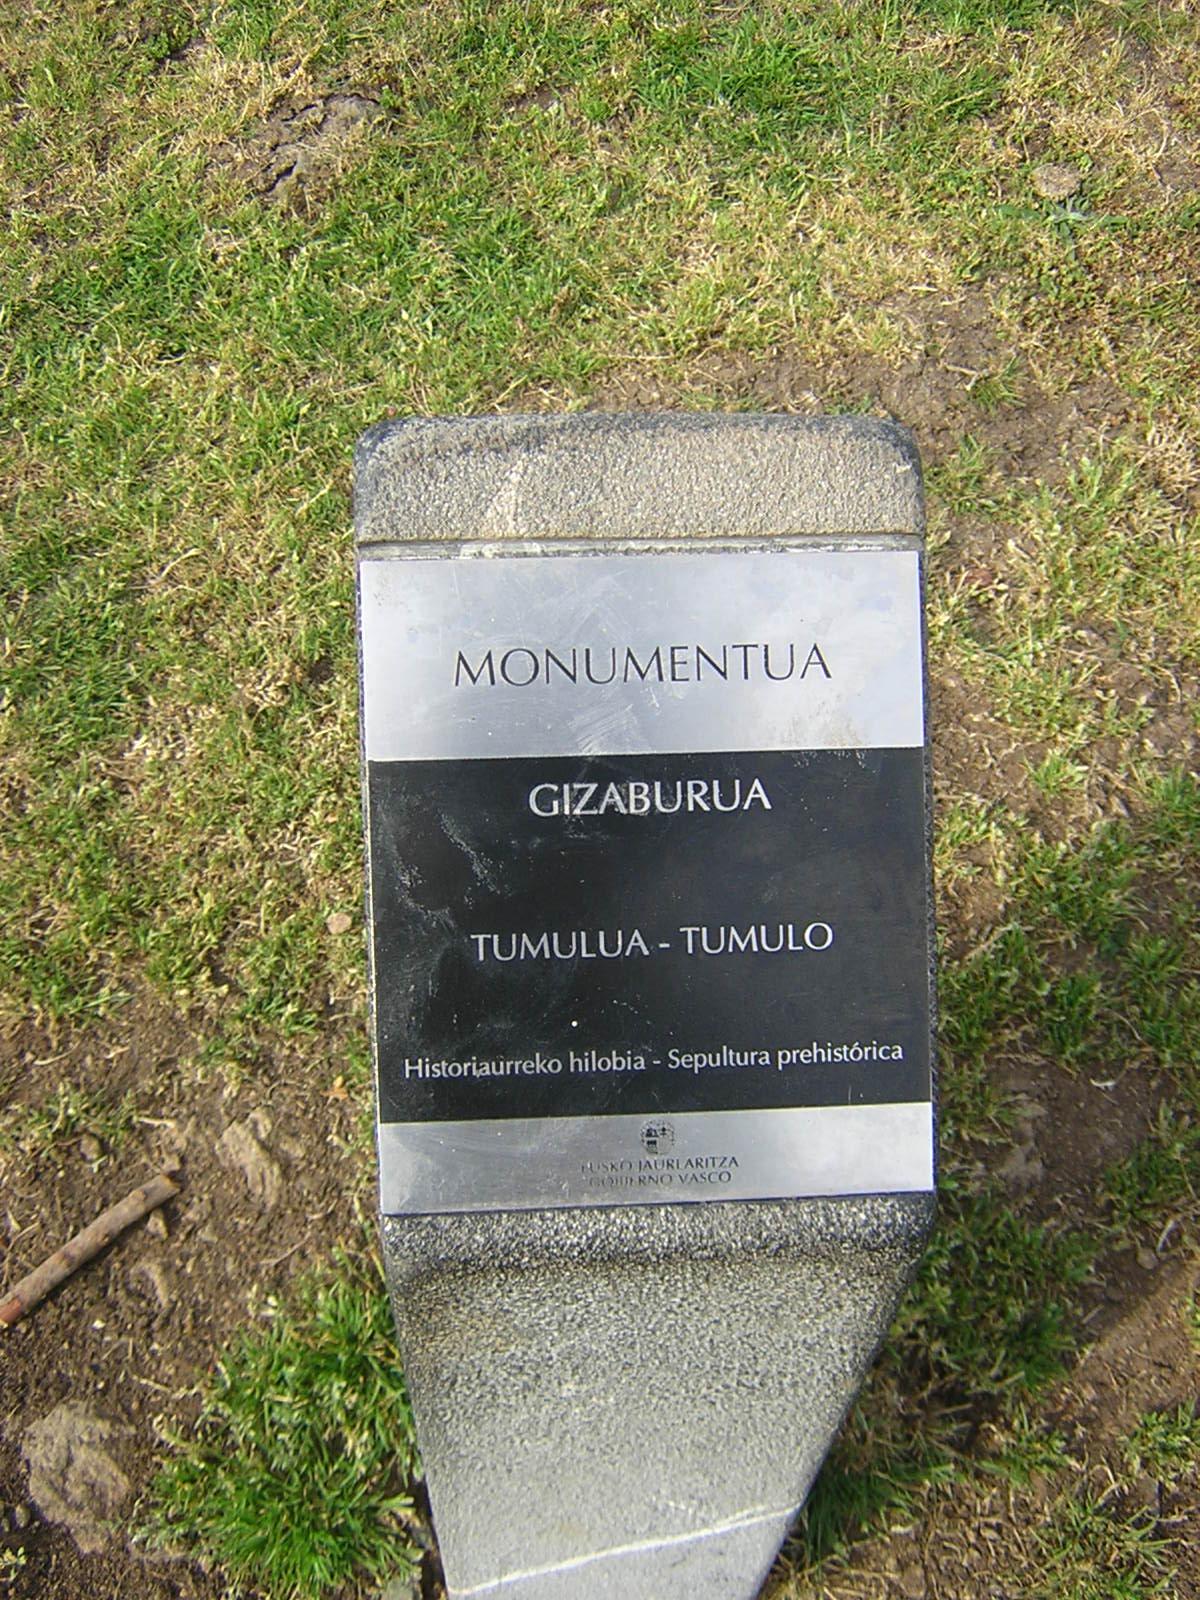 Túmulo Gizaburua Tumuloa